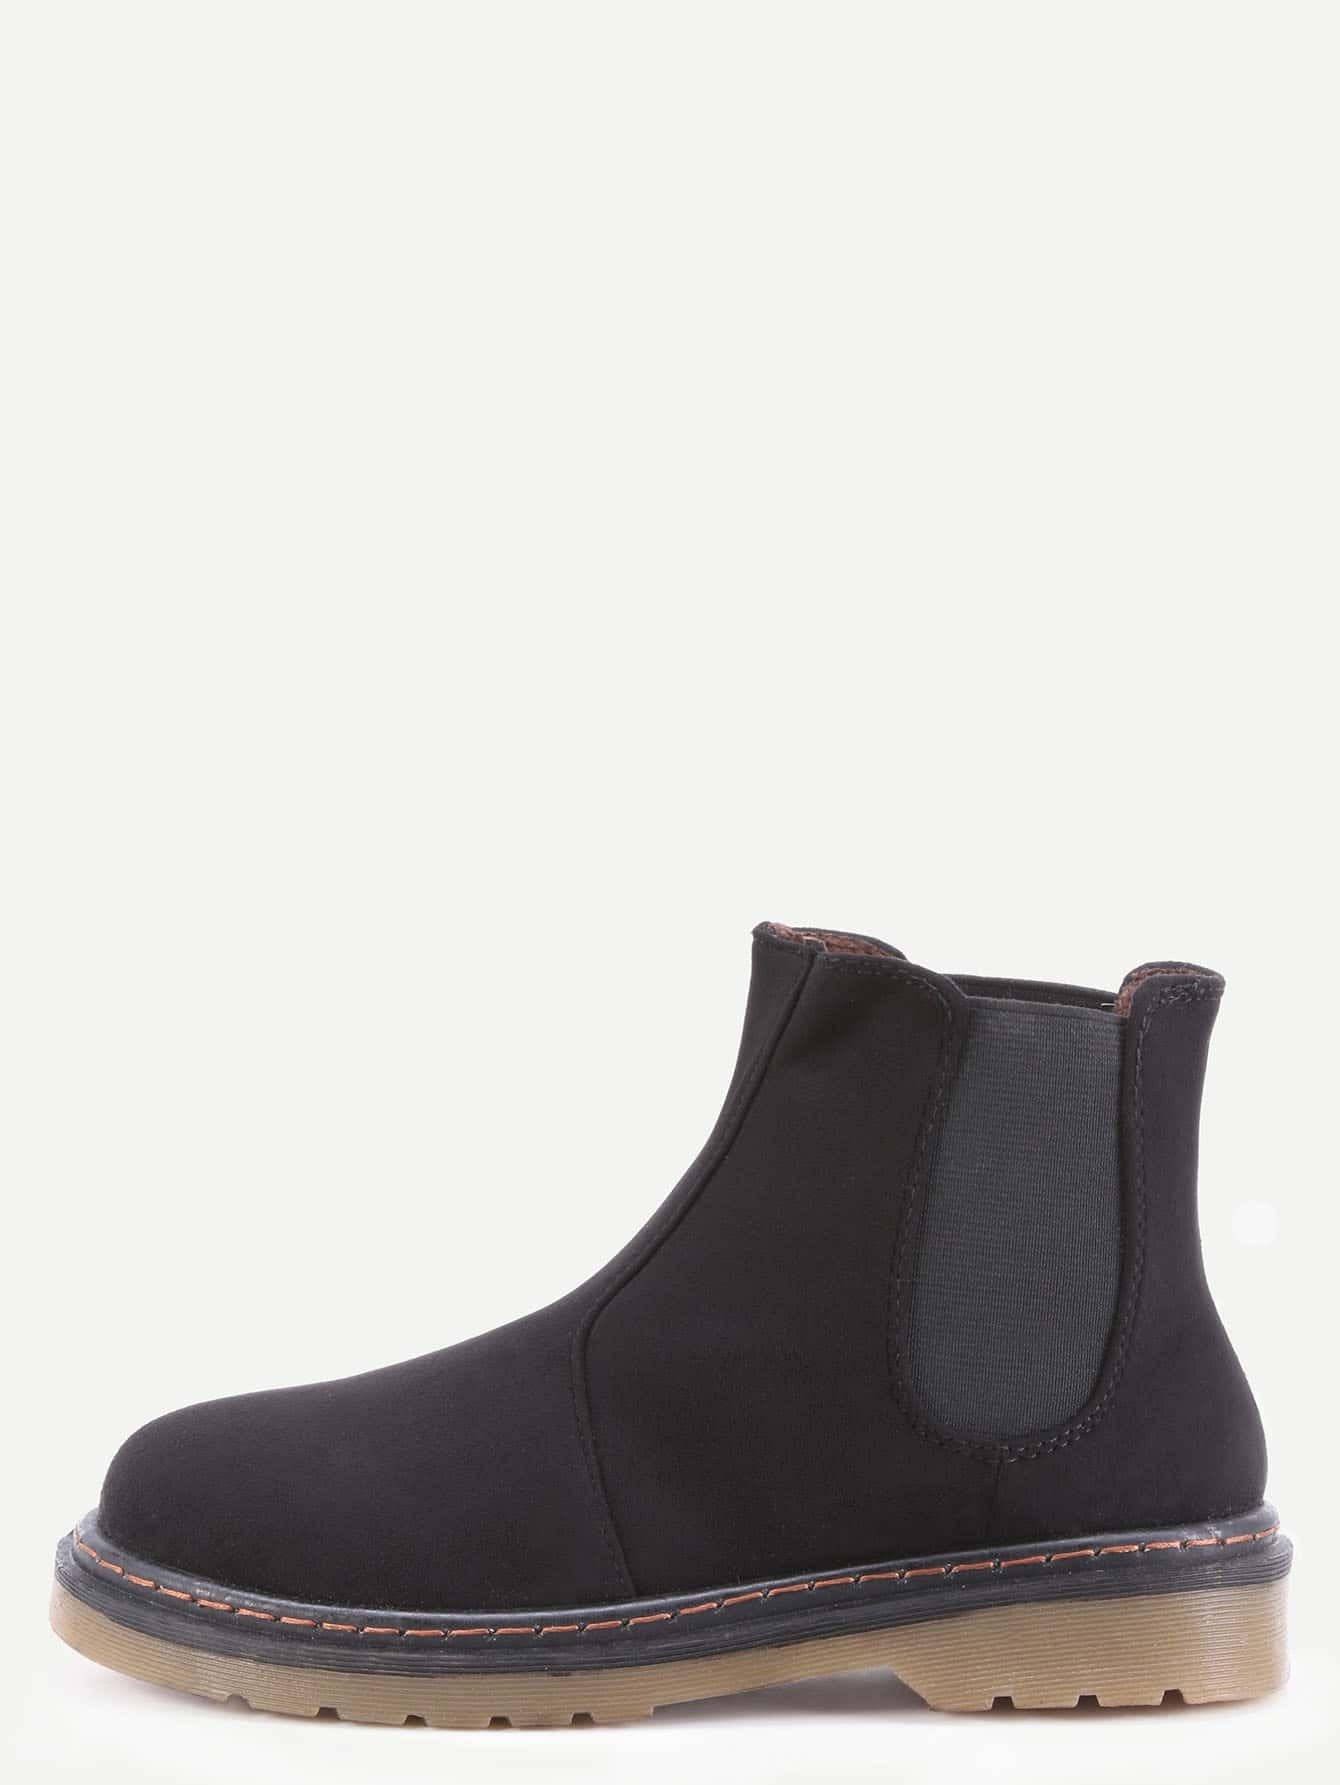 Фото Black Faux Suede Elastic Rubber Soled Short Boots. Купить с доставкой